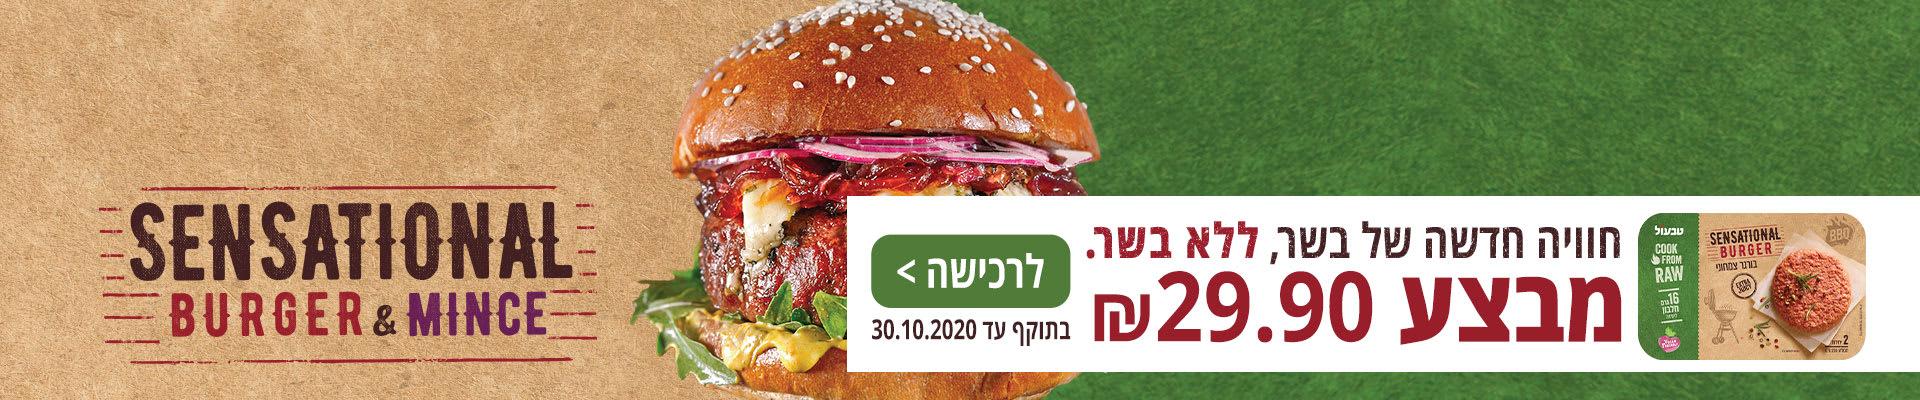 SENSATIONAL BURGER חוויה חדשה של בשר, ללא בשר. מבצע 29.90 ₪. בתוקף עד 30.10.2020